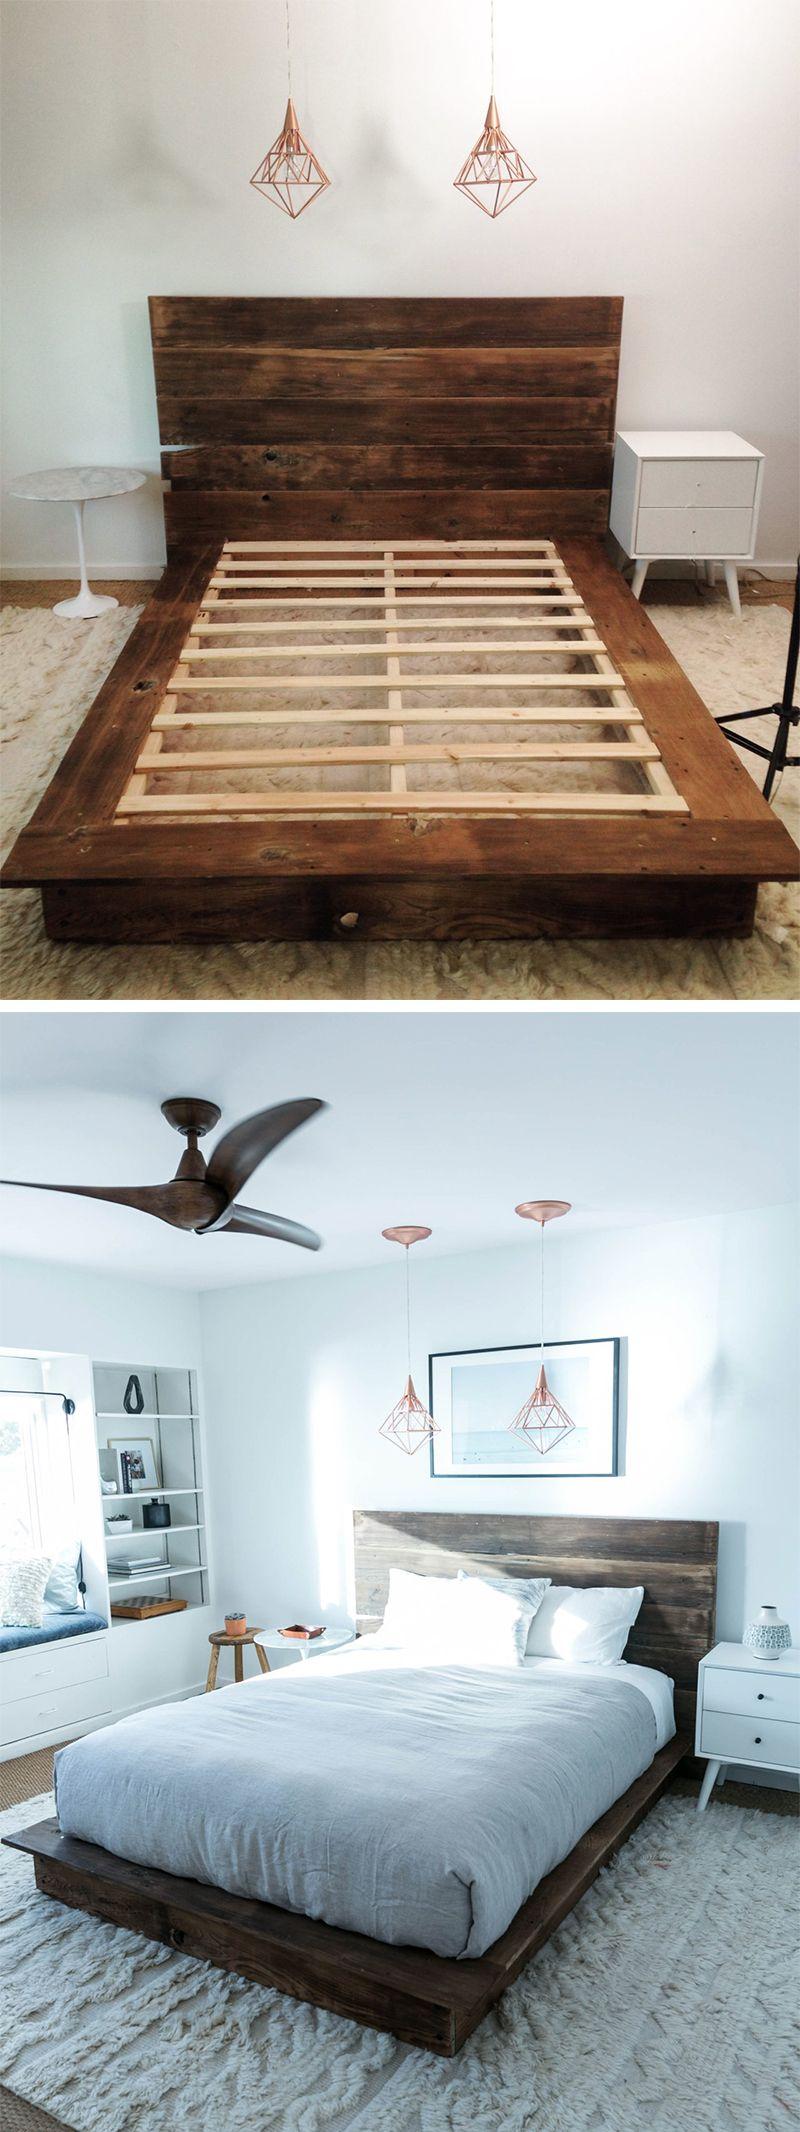 Diy Reclaimed Wood Platform Bed Bed Frame Headboard Wood